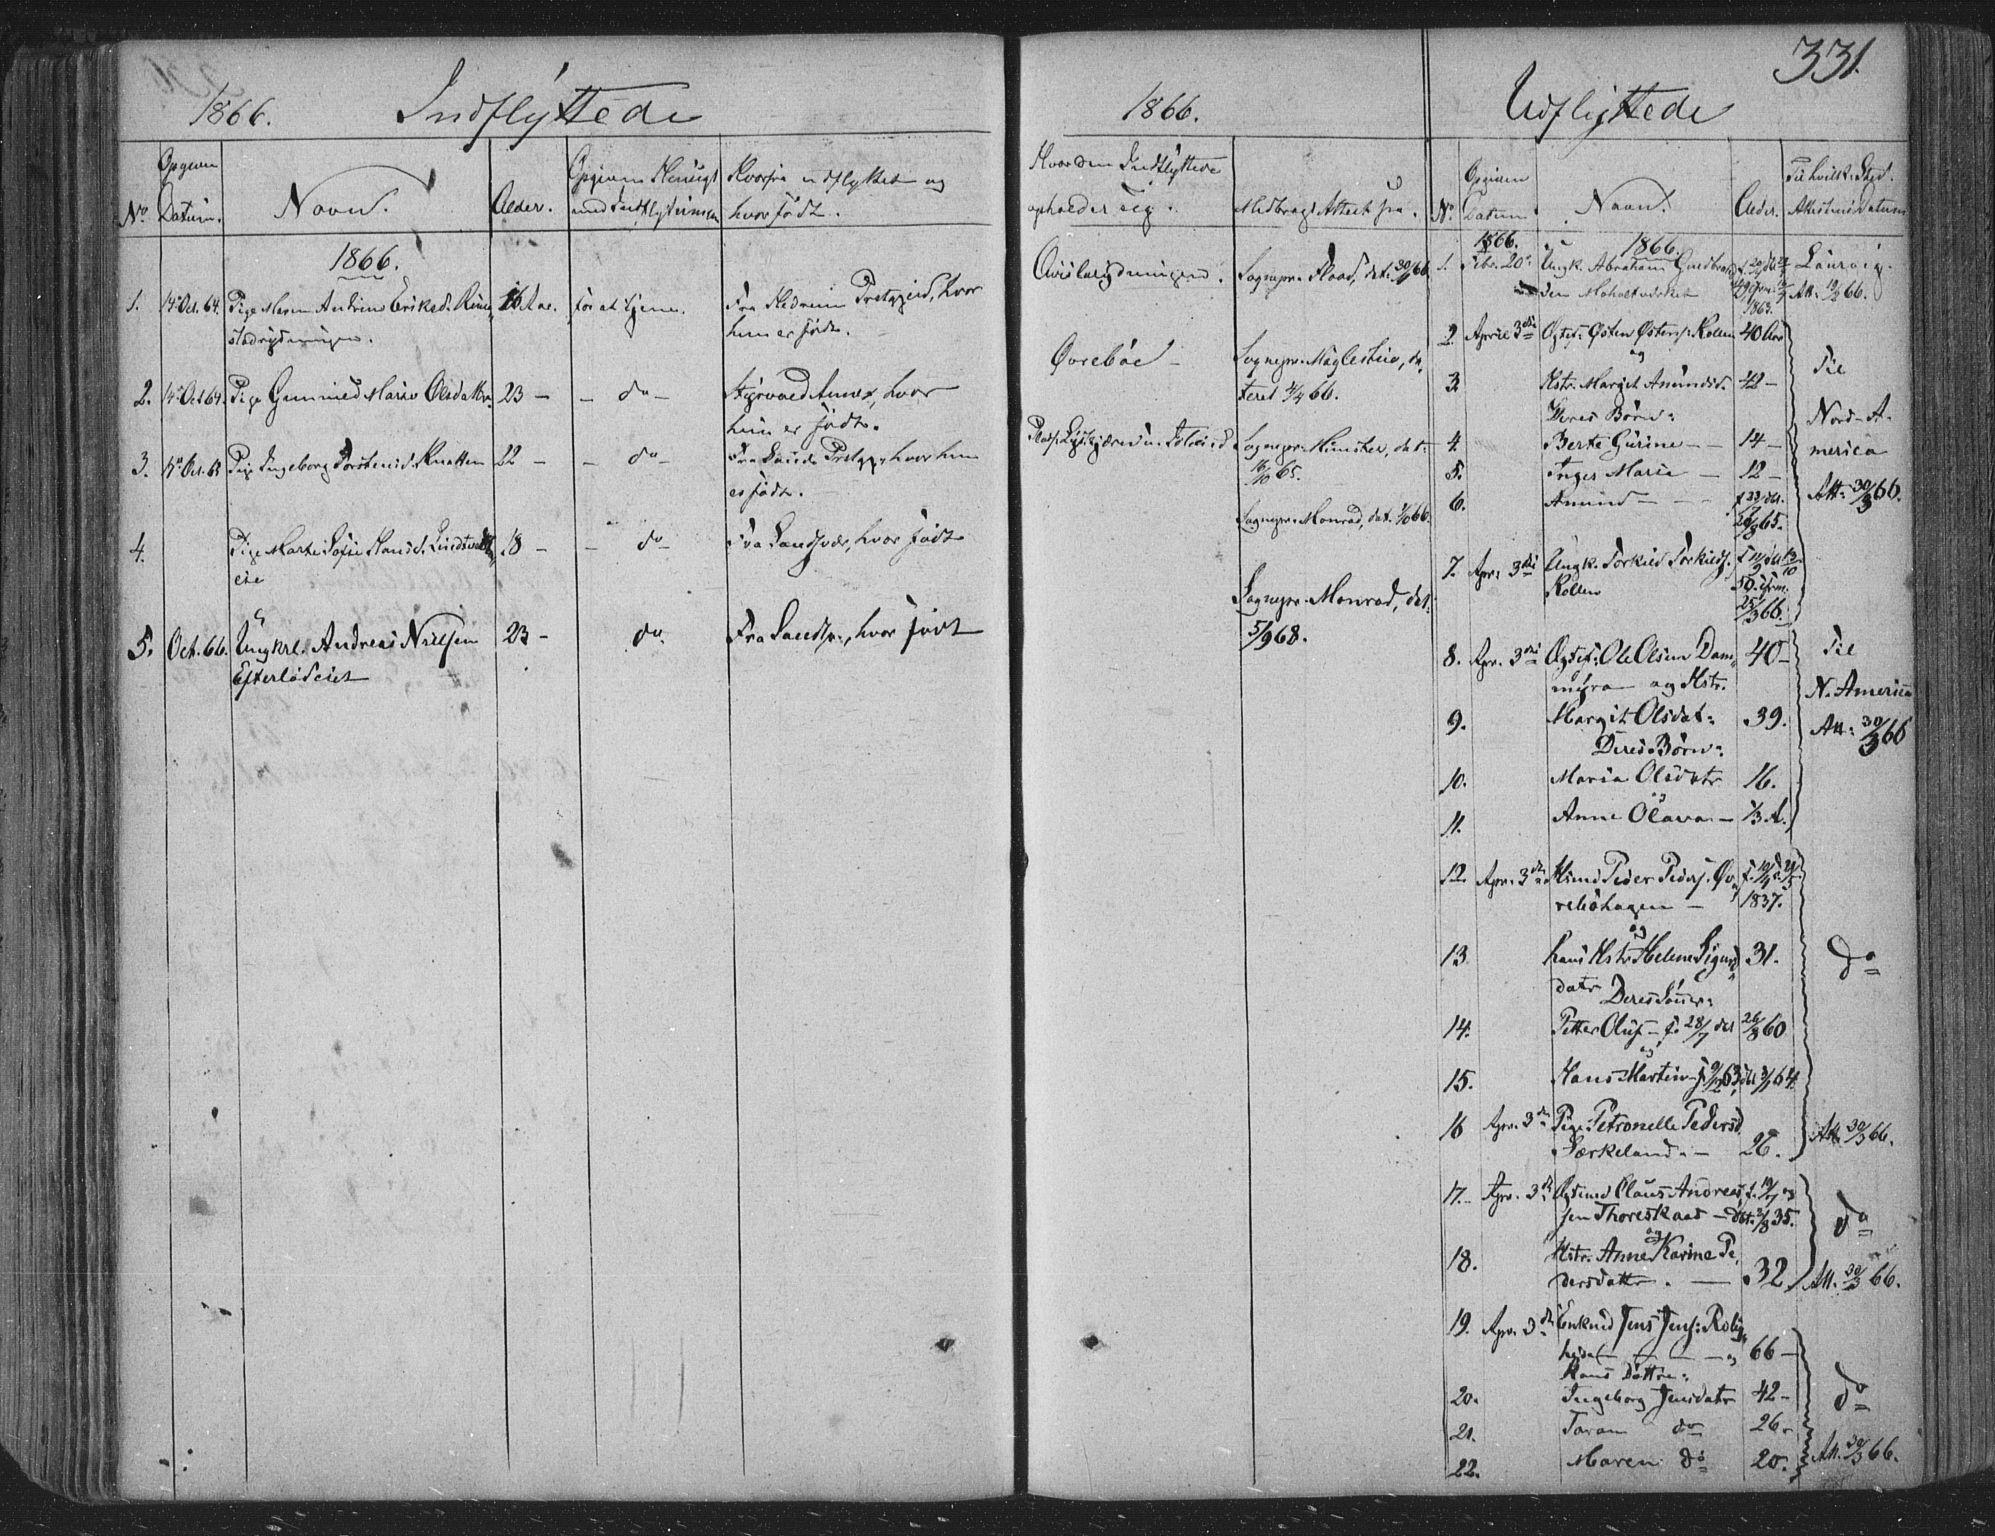 SAKO, Siljan kirkebøker, F/Fa/L0001: Parish register (official) no. 1, 1831-1870, p. 331